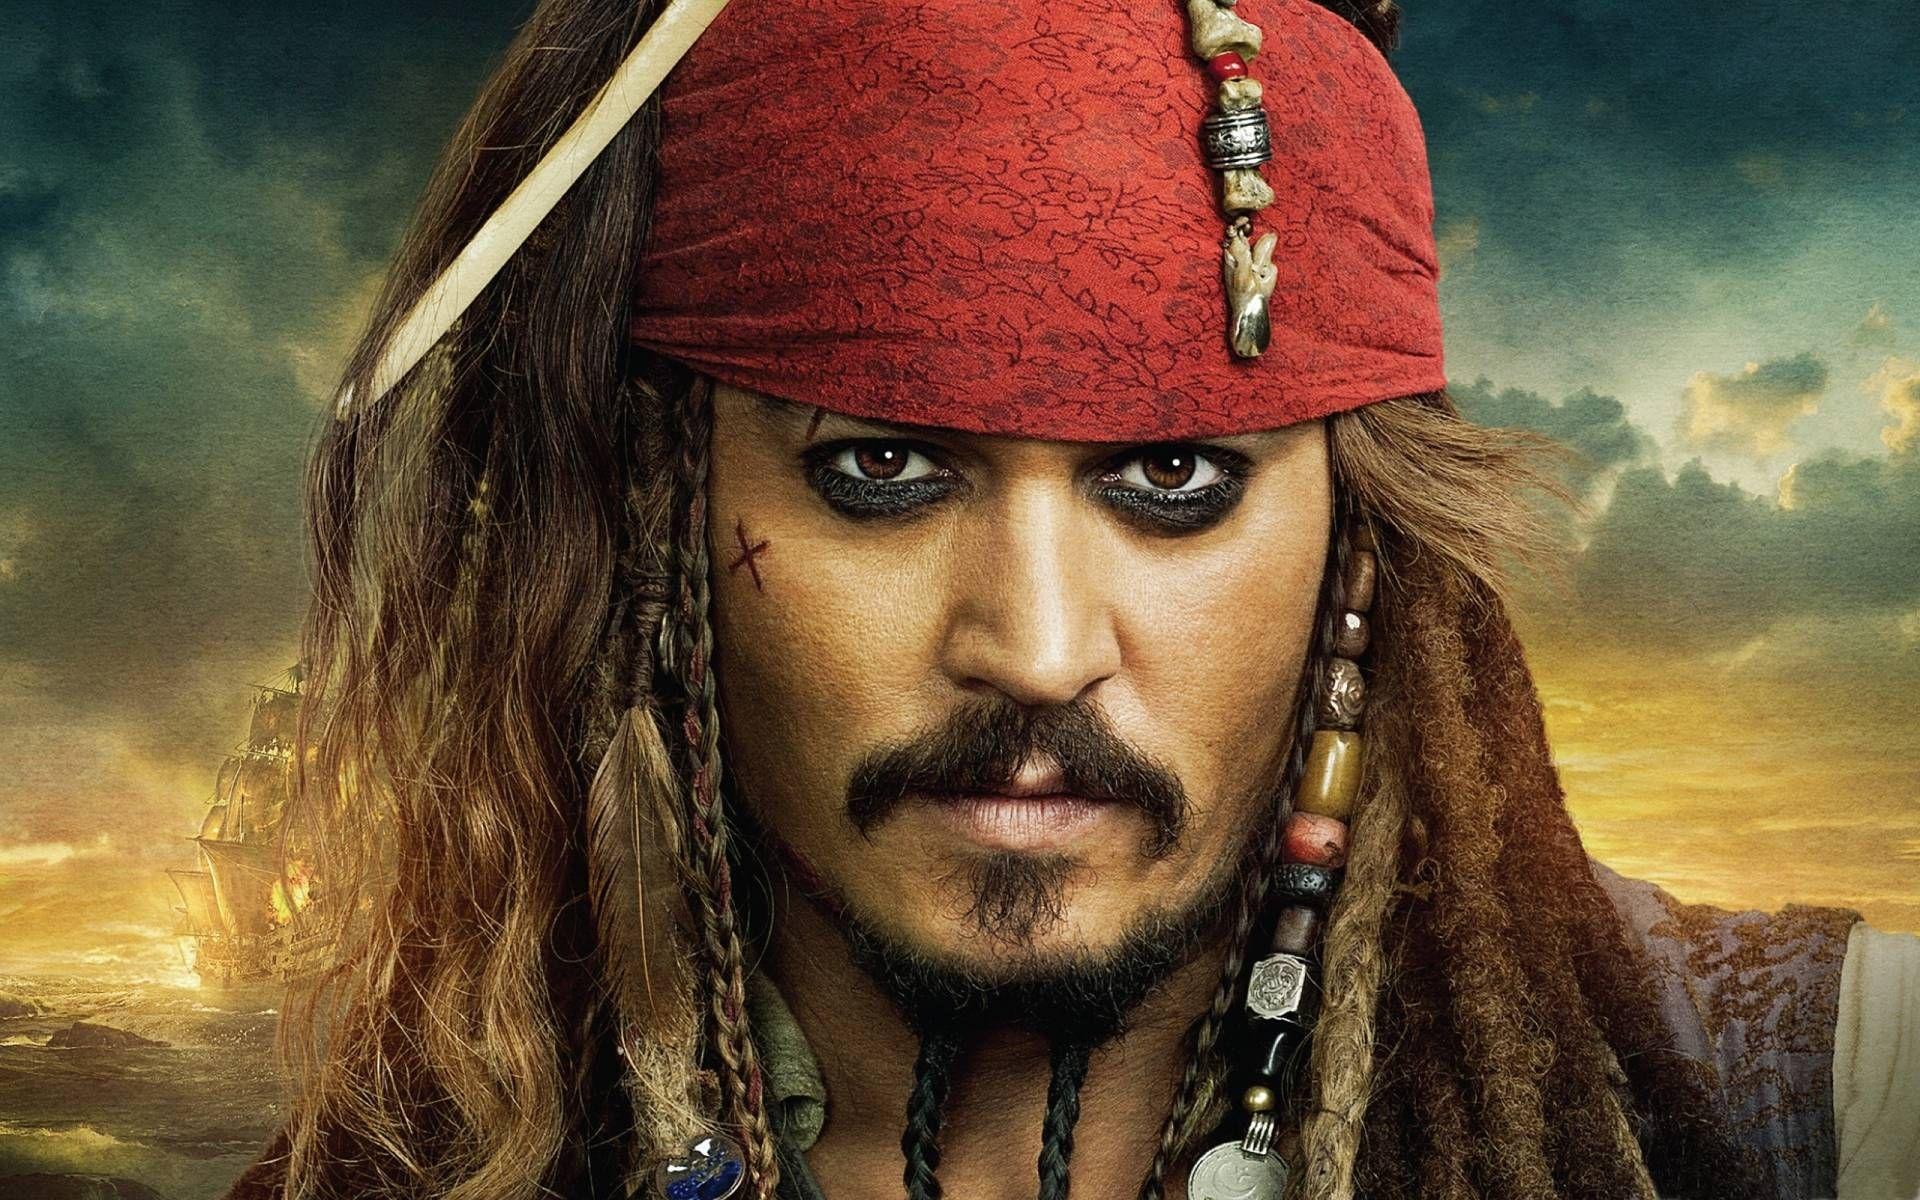 Captain Jack Sparrow Cave Jack Sparrow Wallpaper Johnny Depp Wallpaper Johnny Depp